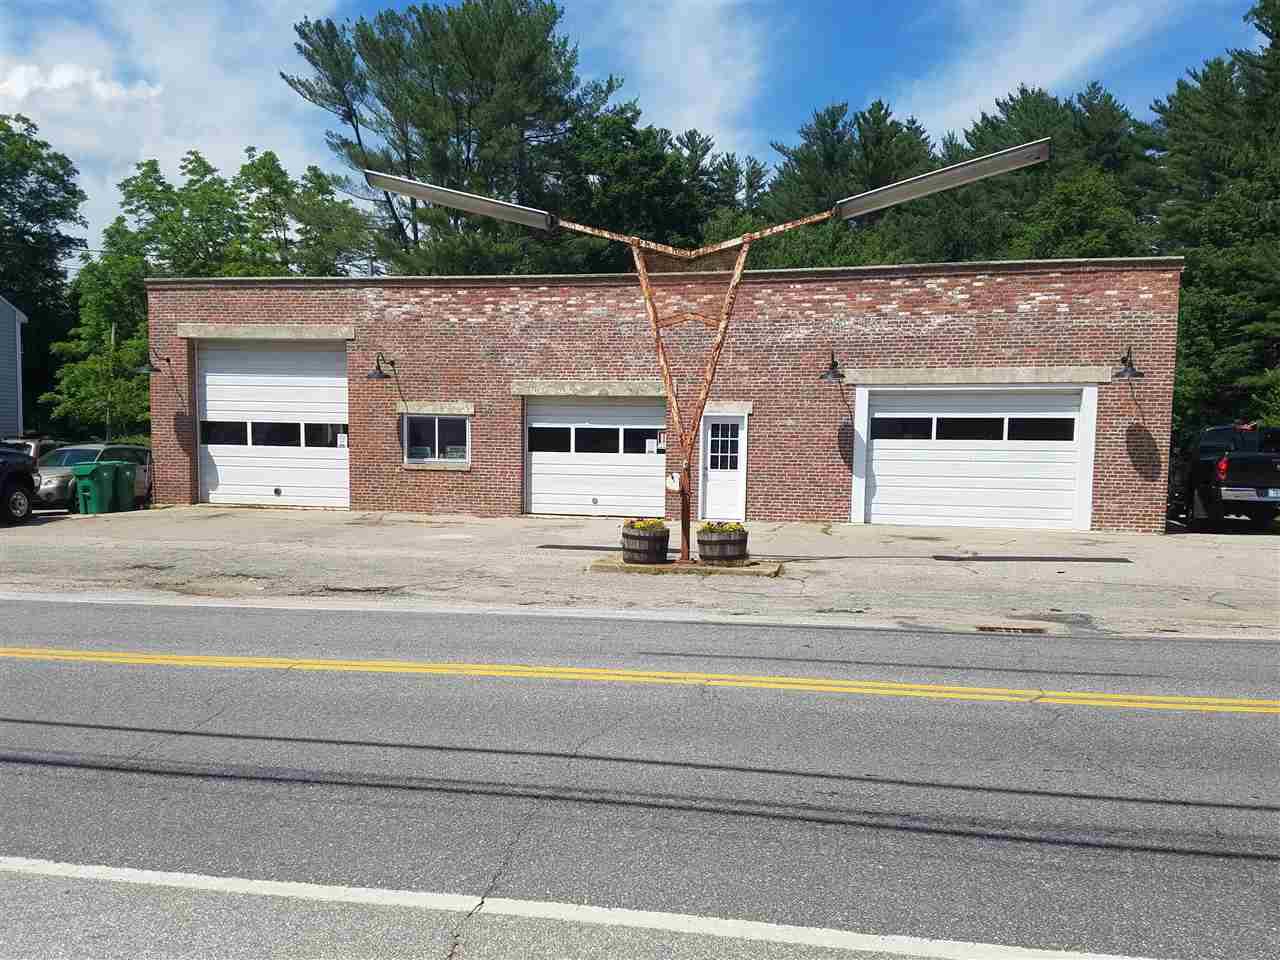 Photo of 280 Main Street Fremont NH 03044